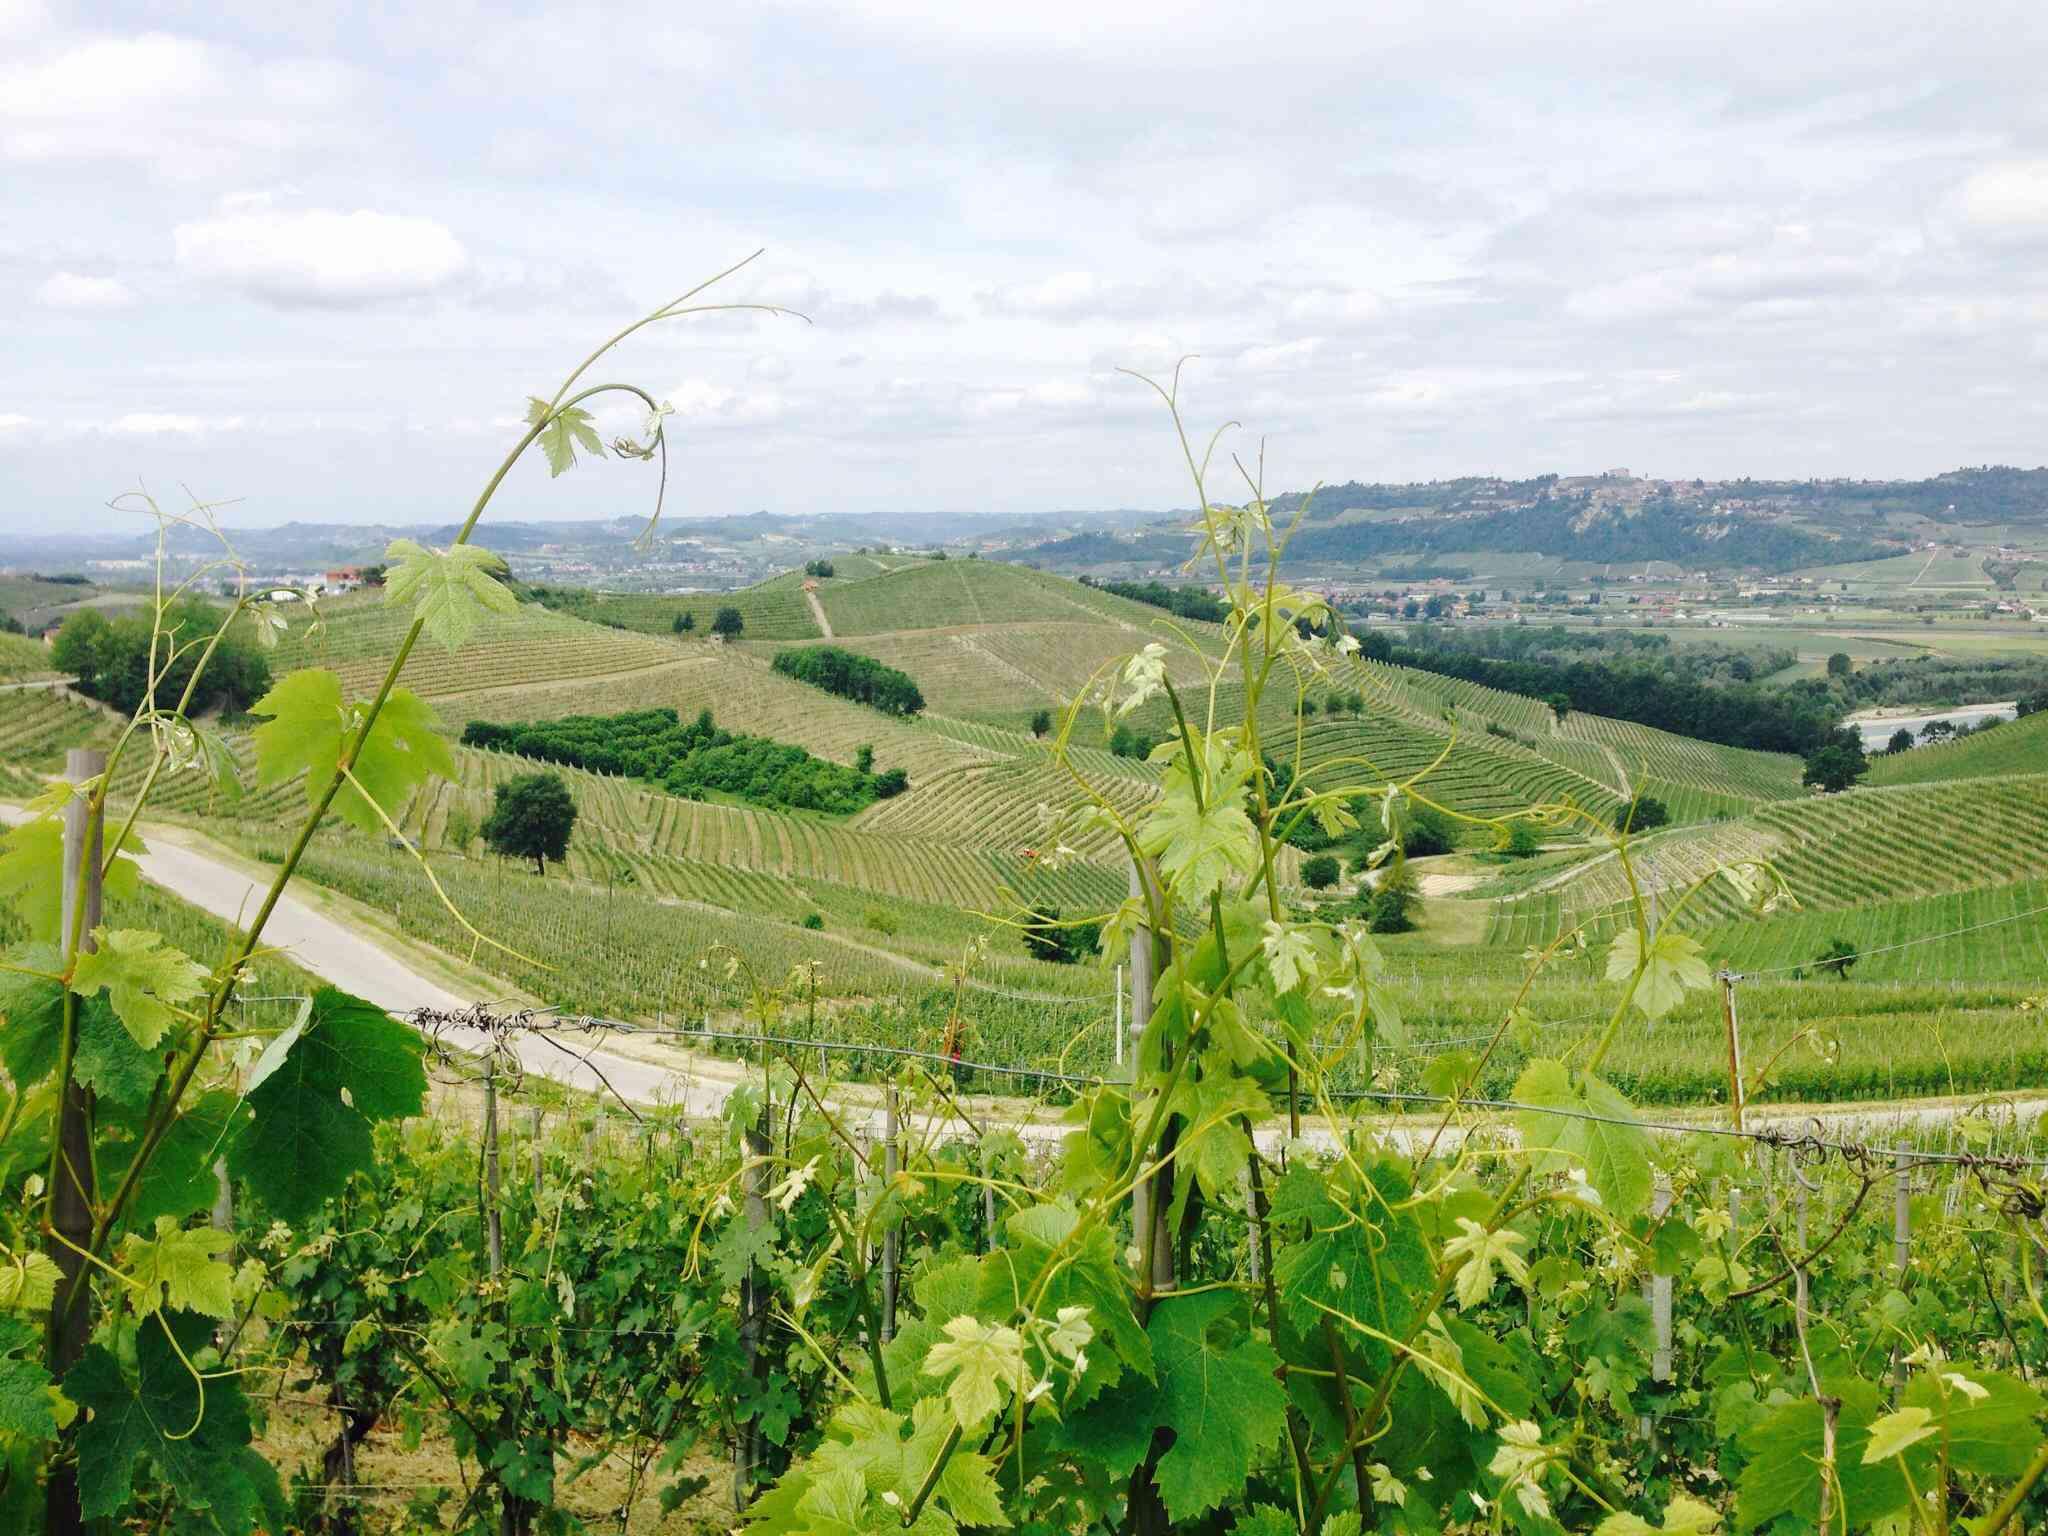 Vineyards in the Monferrato area